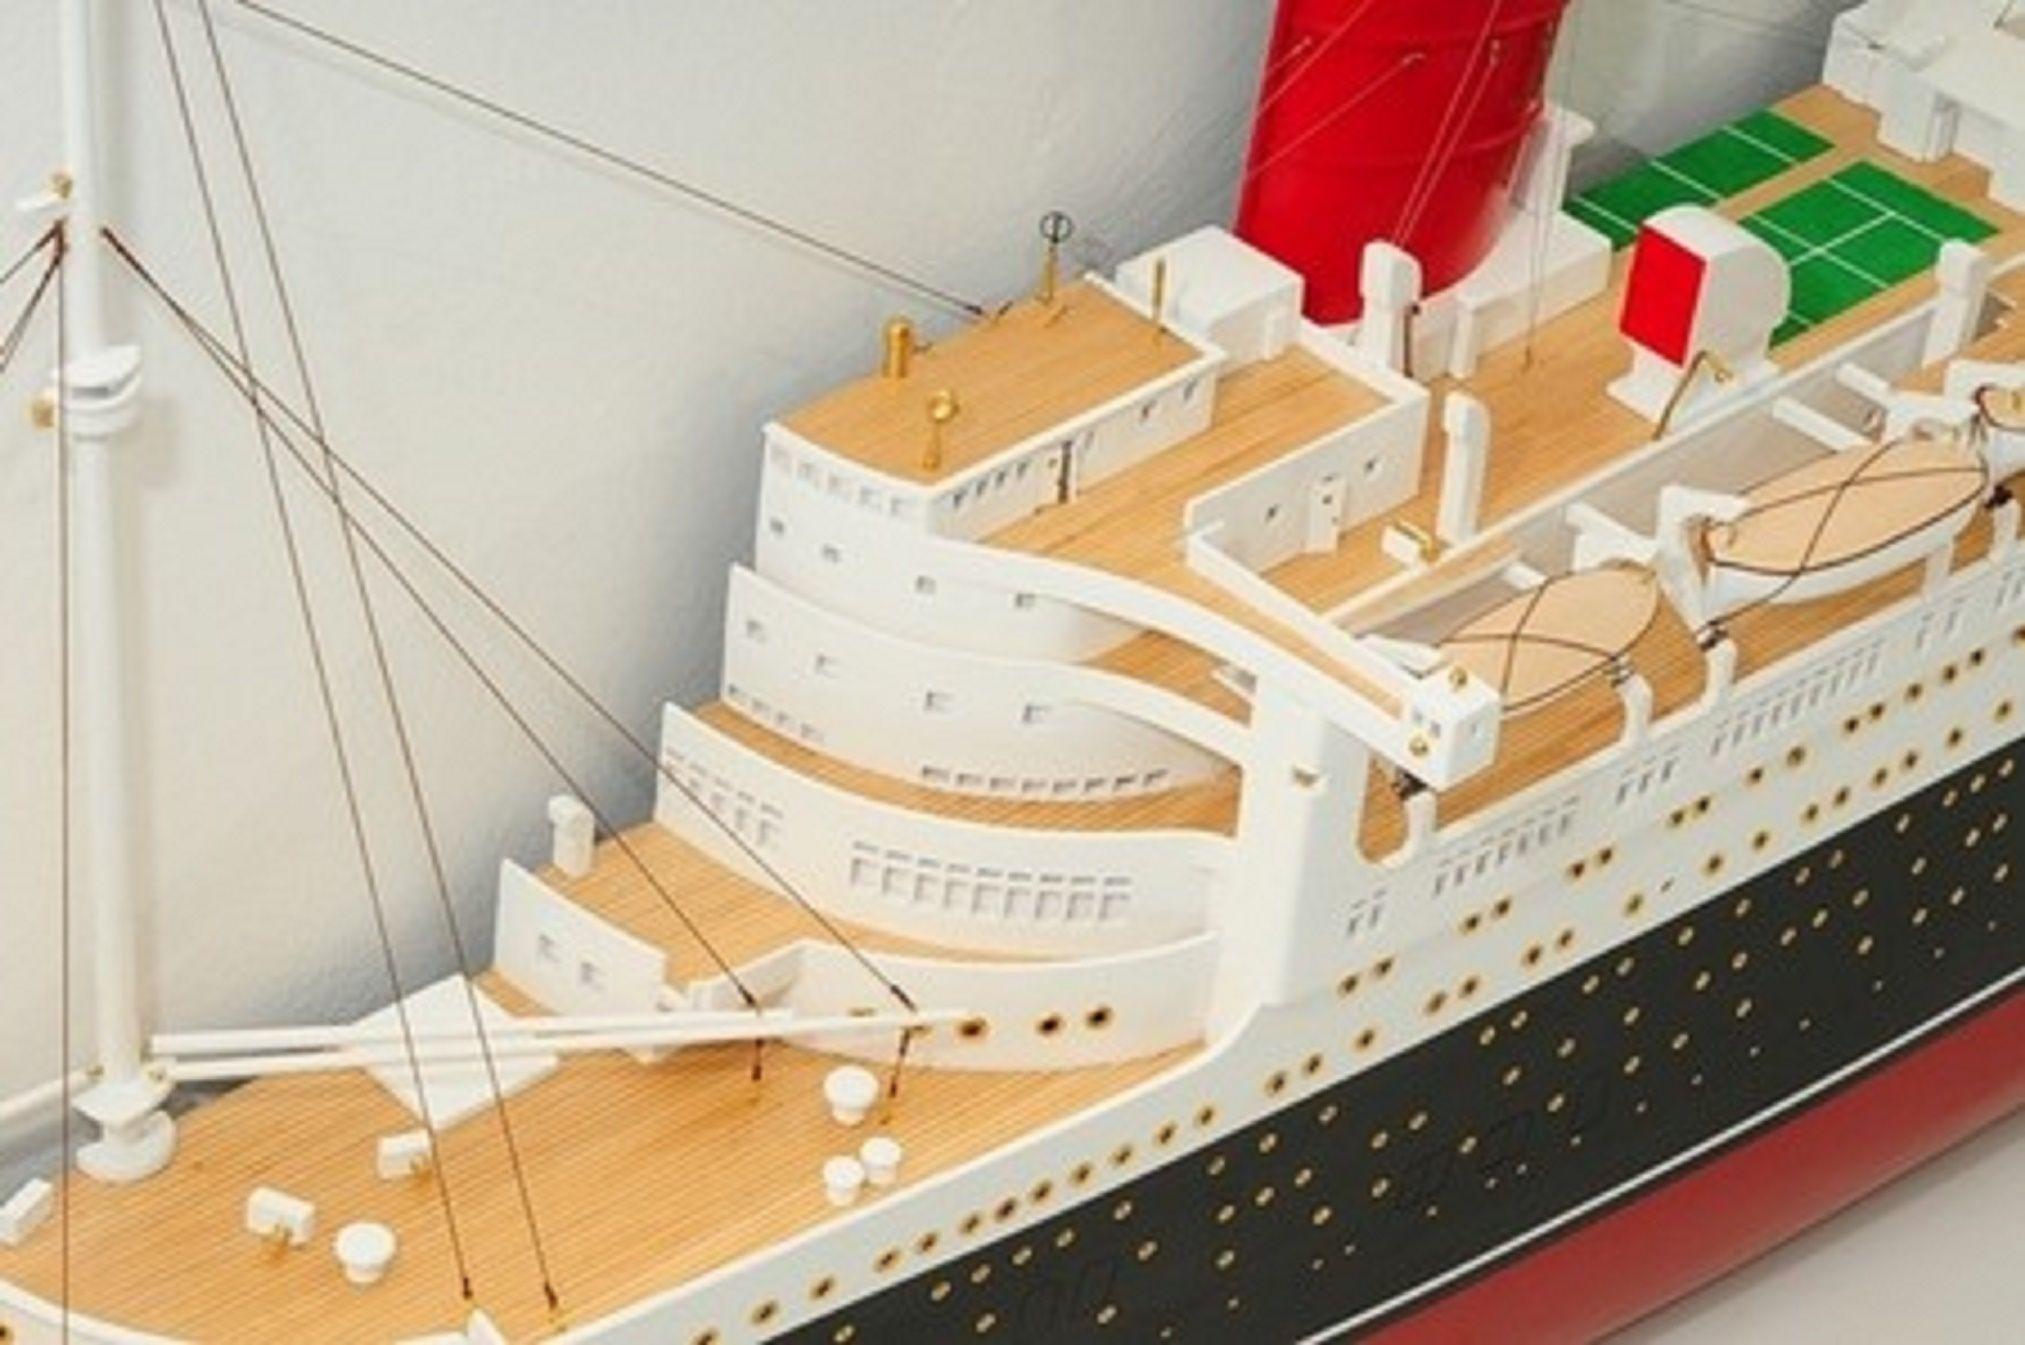 670-7590-RMS-Queen-Mary-Half-Model-Premier-Range